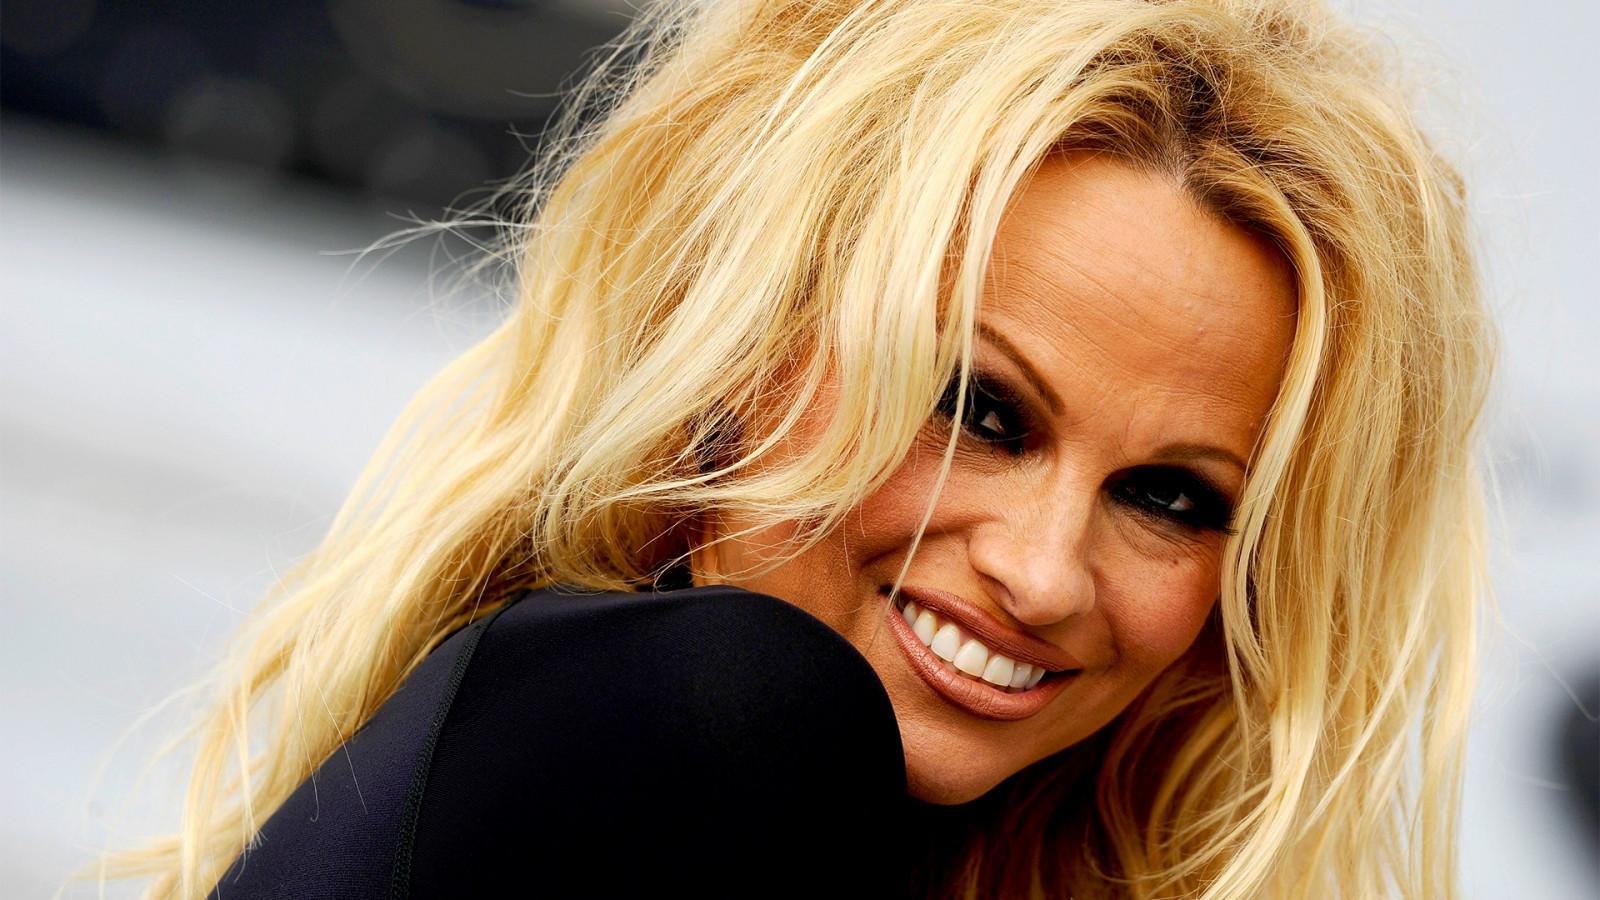 hintergrundbilder gesicht frau modell portr t blond lange haare fotografie mode haar. Black Bedroom Furniture Sets. Home Design Ideas